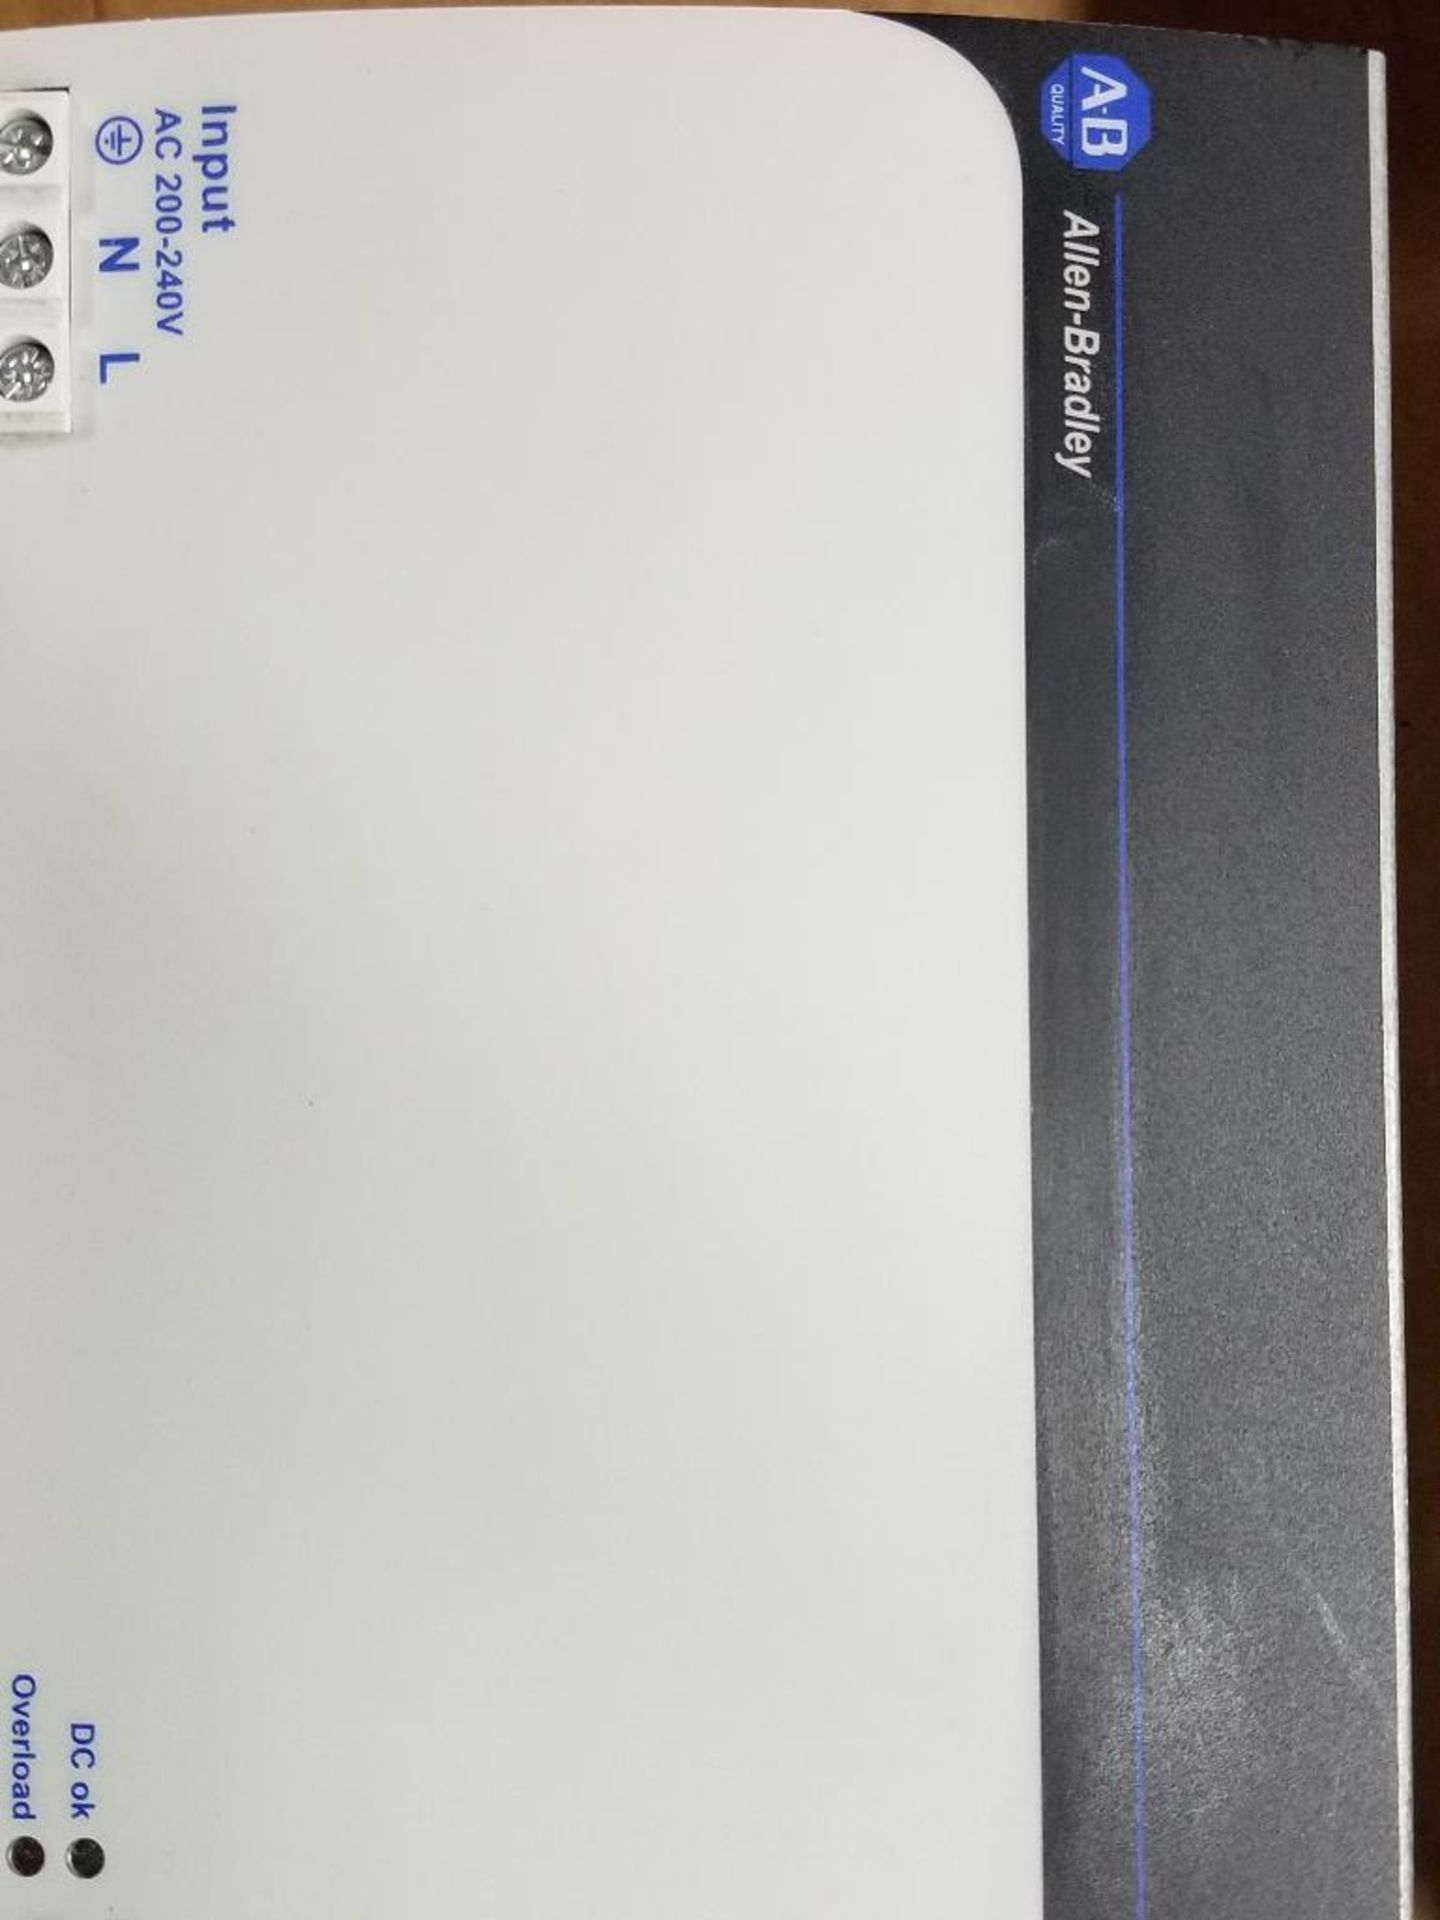 Allen Bradley 1606-XL power supply. 1606-XL480E. - Image 3 of 4